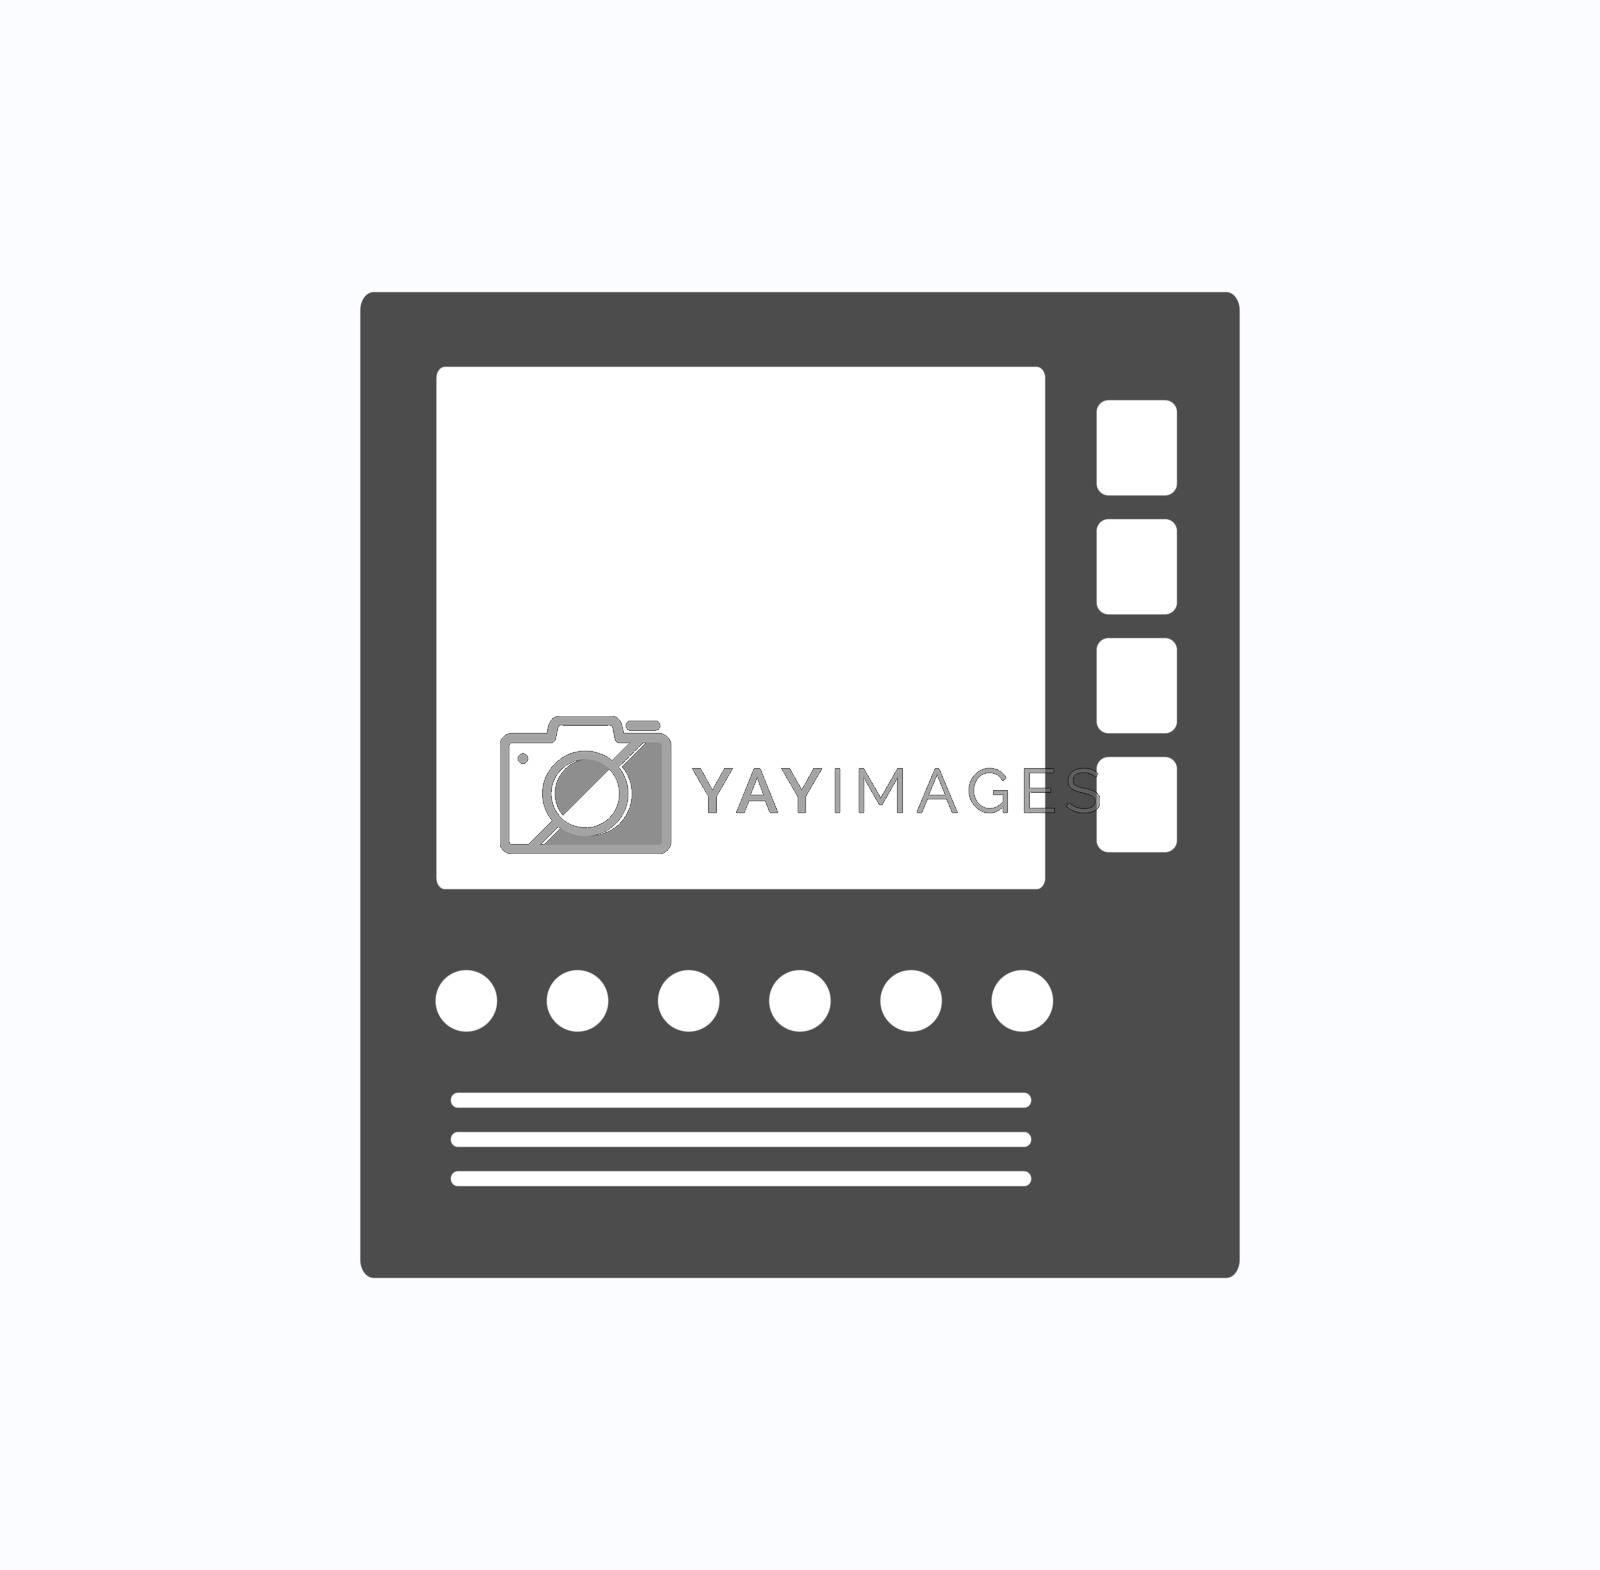 Intercom for communication  Icon